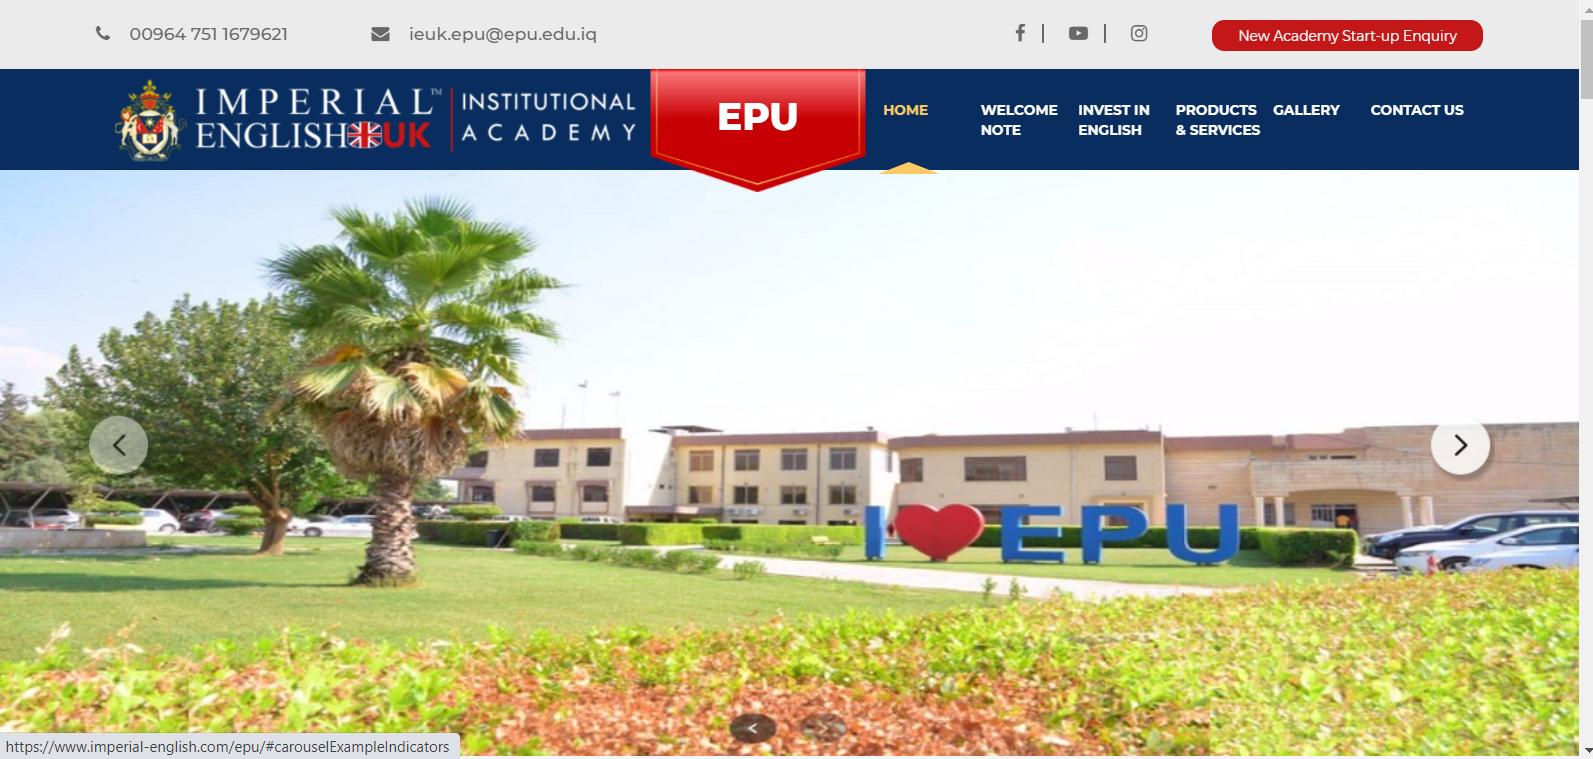 Erbil Polytechnic University (EPU) Offers International English Language Course in Collaboration with Imperial English UK (IEUK)